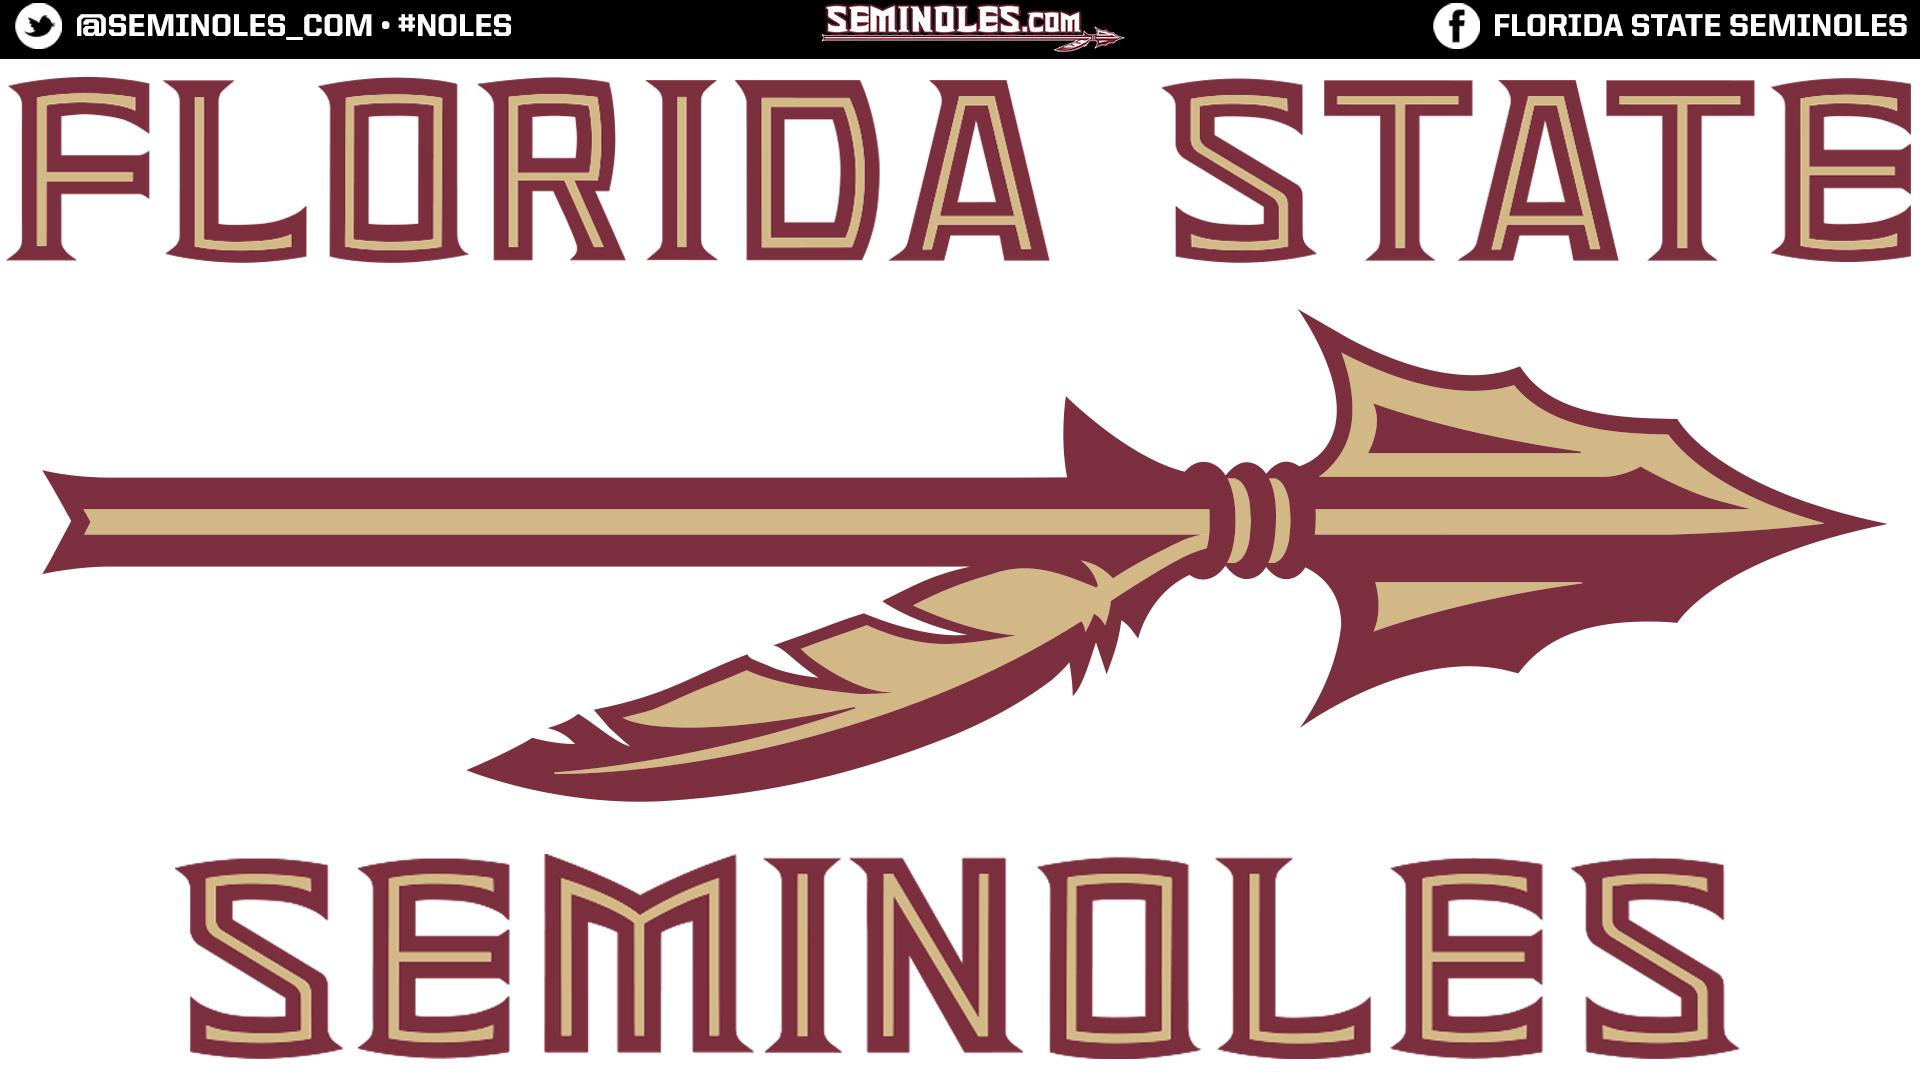 Florida State Seminoles Football Desktop Wallpaper